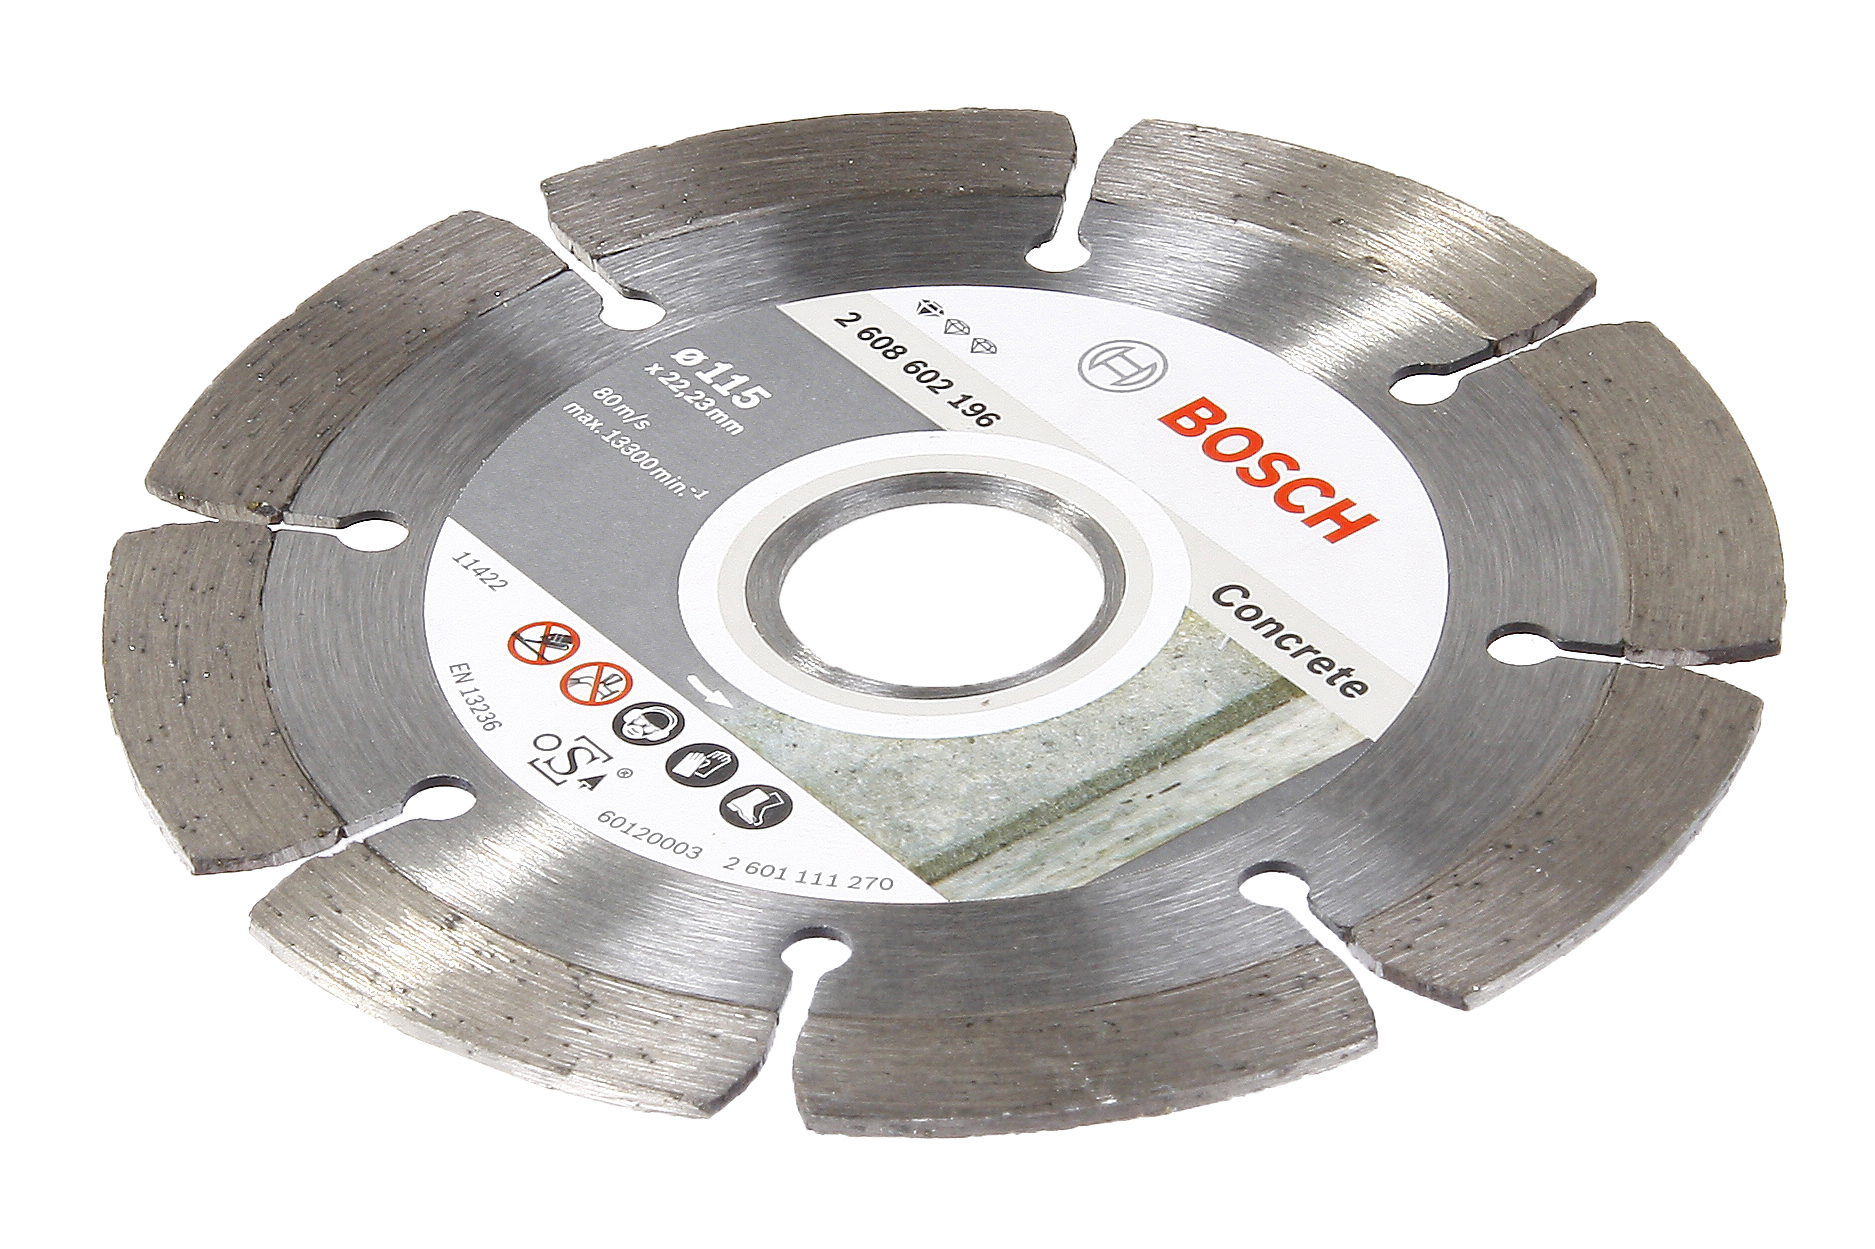 Фото 1/2 Standard for concrete 150 Х 22,2 сегмент, Круг алмазный